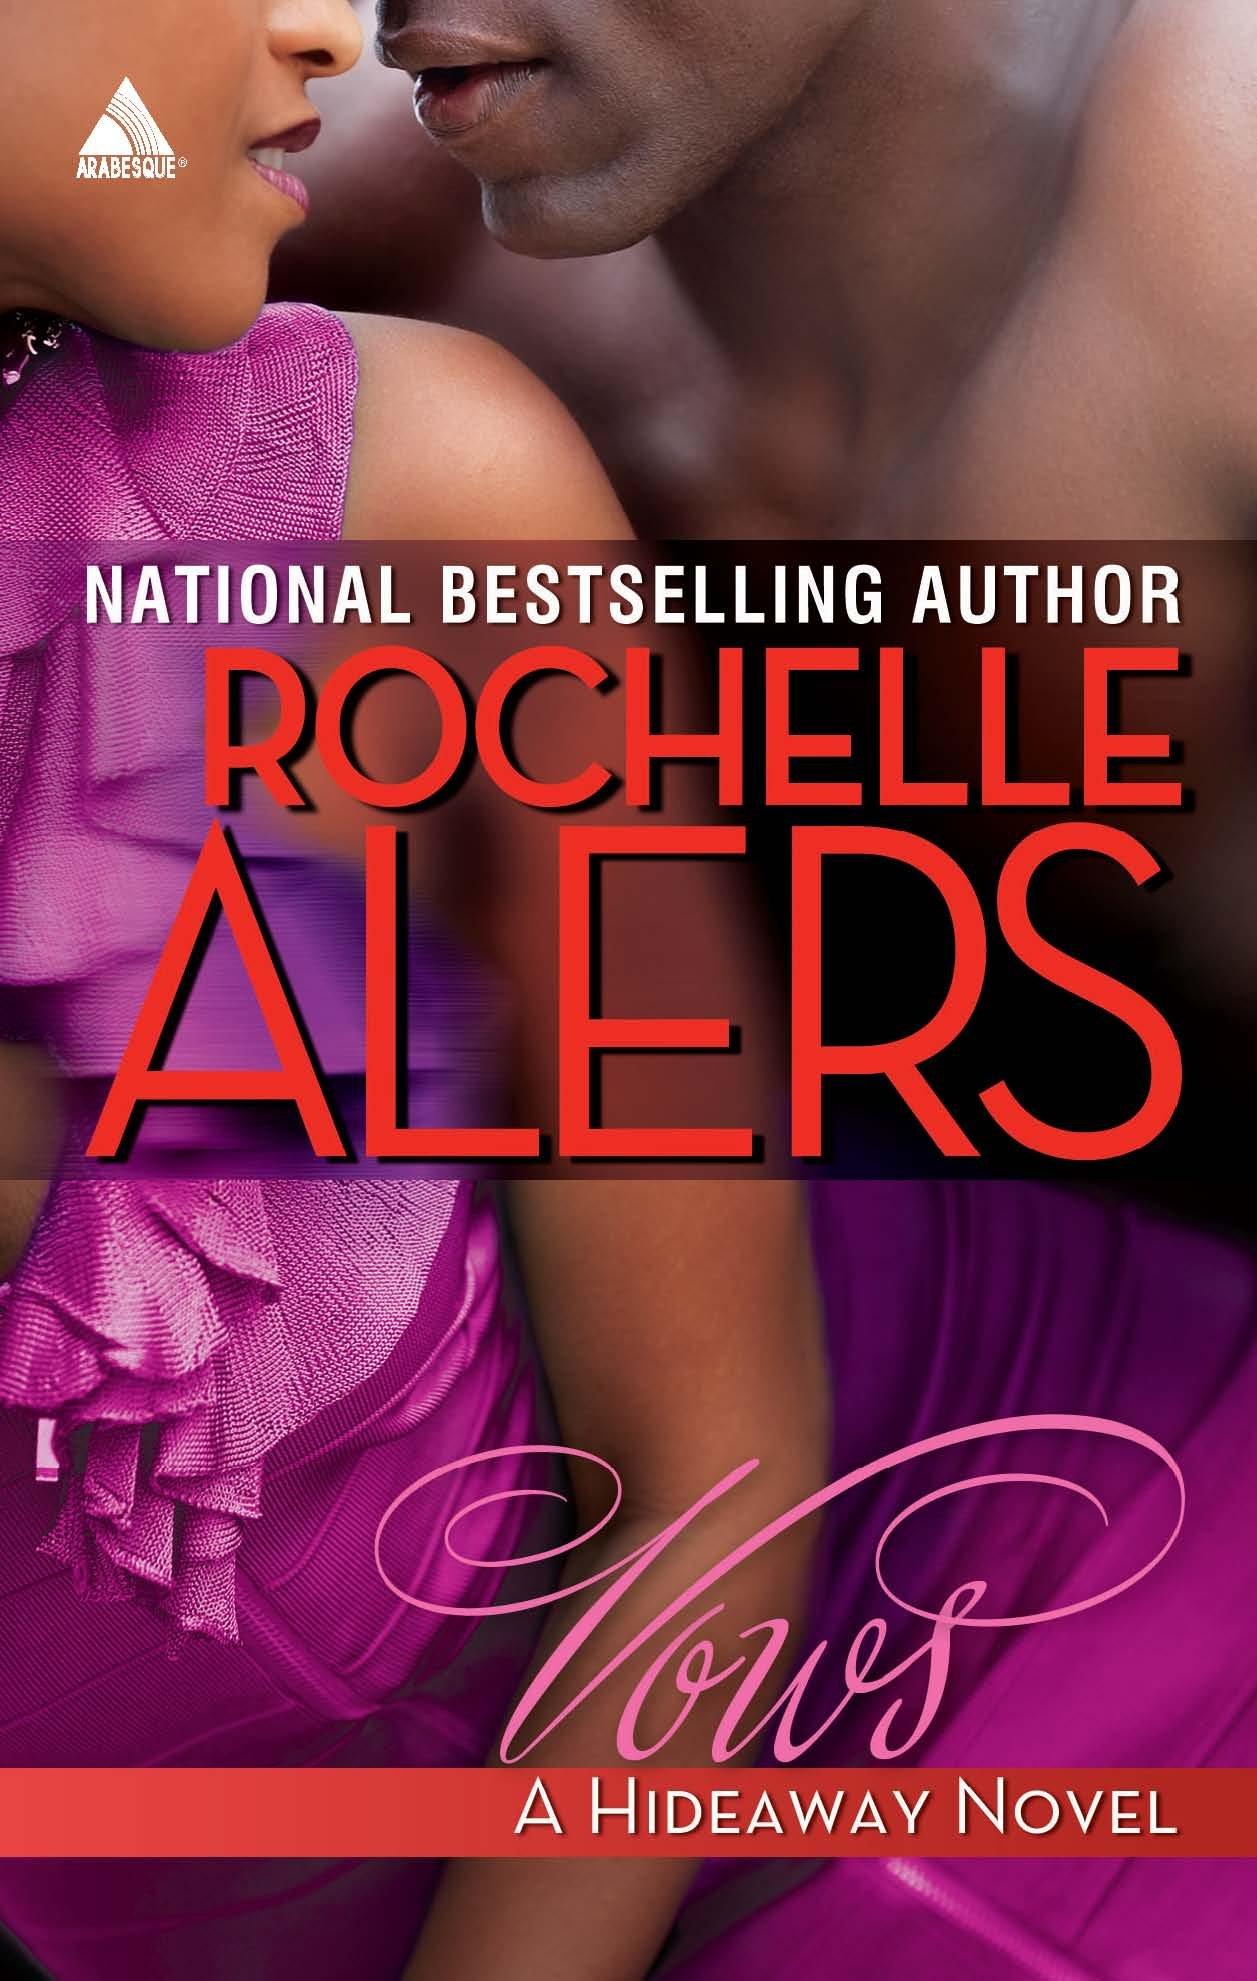 Amazon.com: Vows (Hideaway (Kimani)) (9780373831845): Rochelle Alers: Books